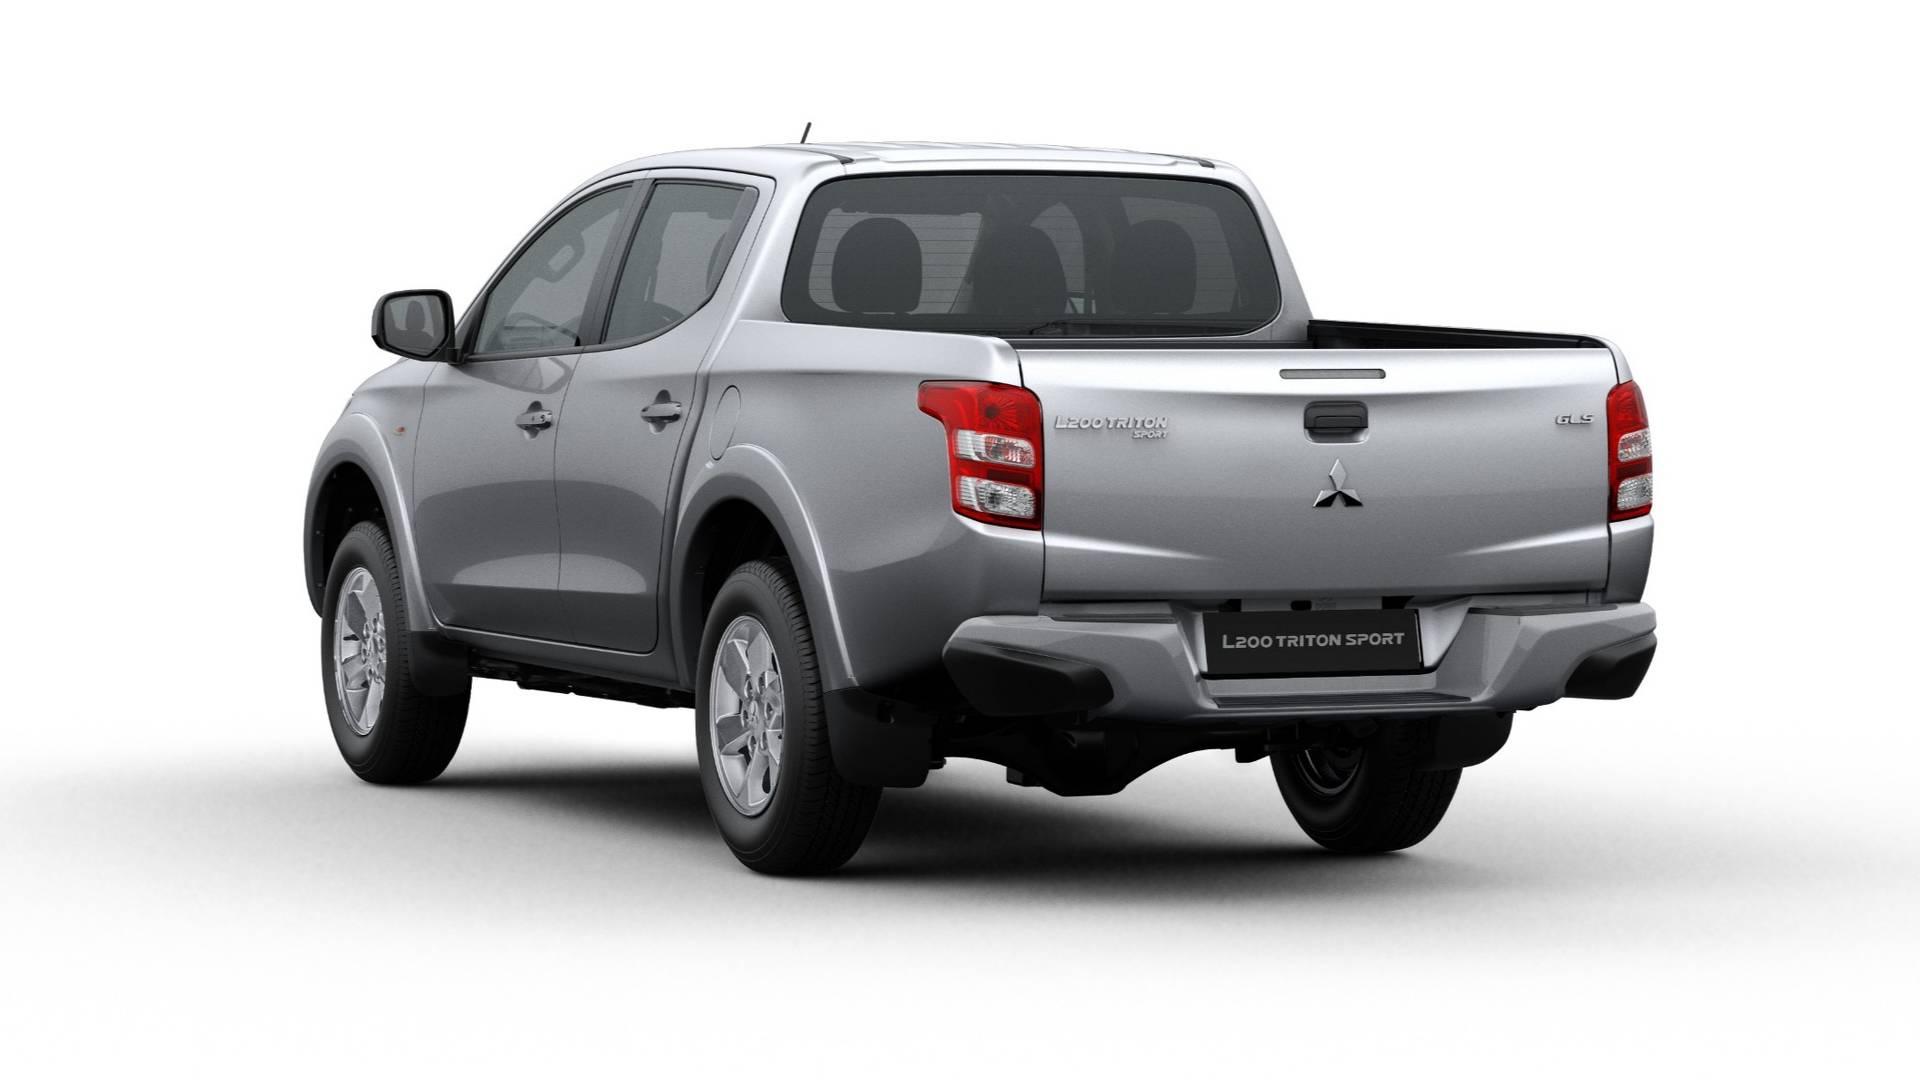 64f2272ef2721 Mitsubishi L200 Triton Sport troca versões na linha 2019 (veja preços)